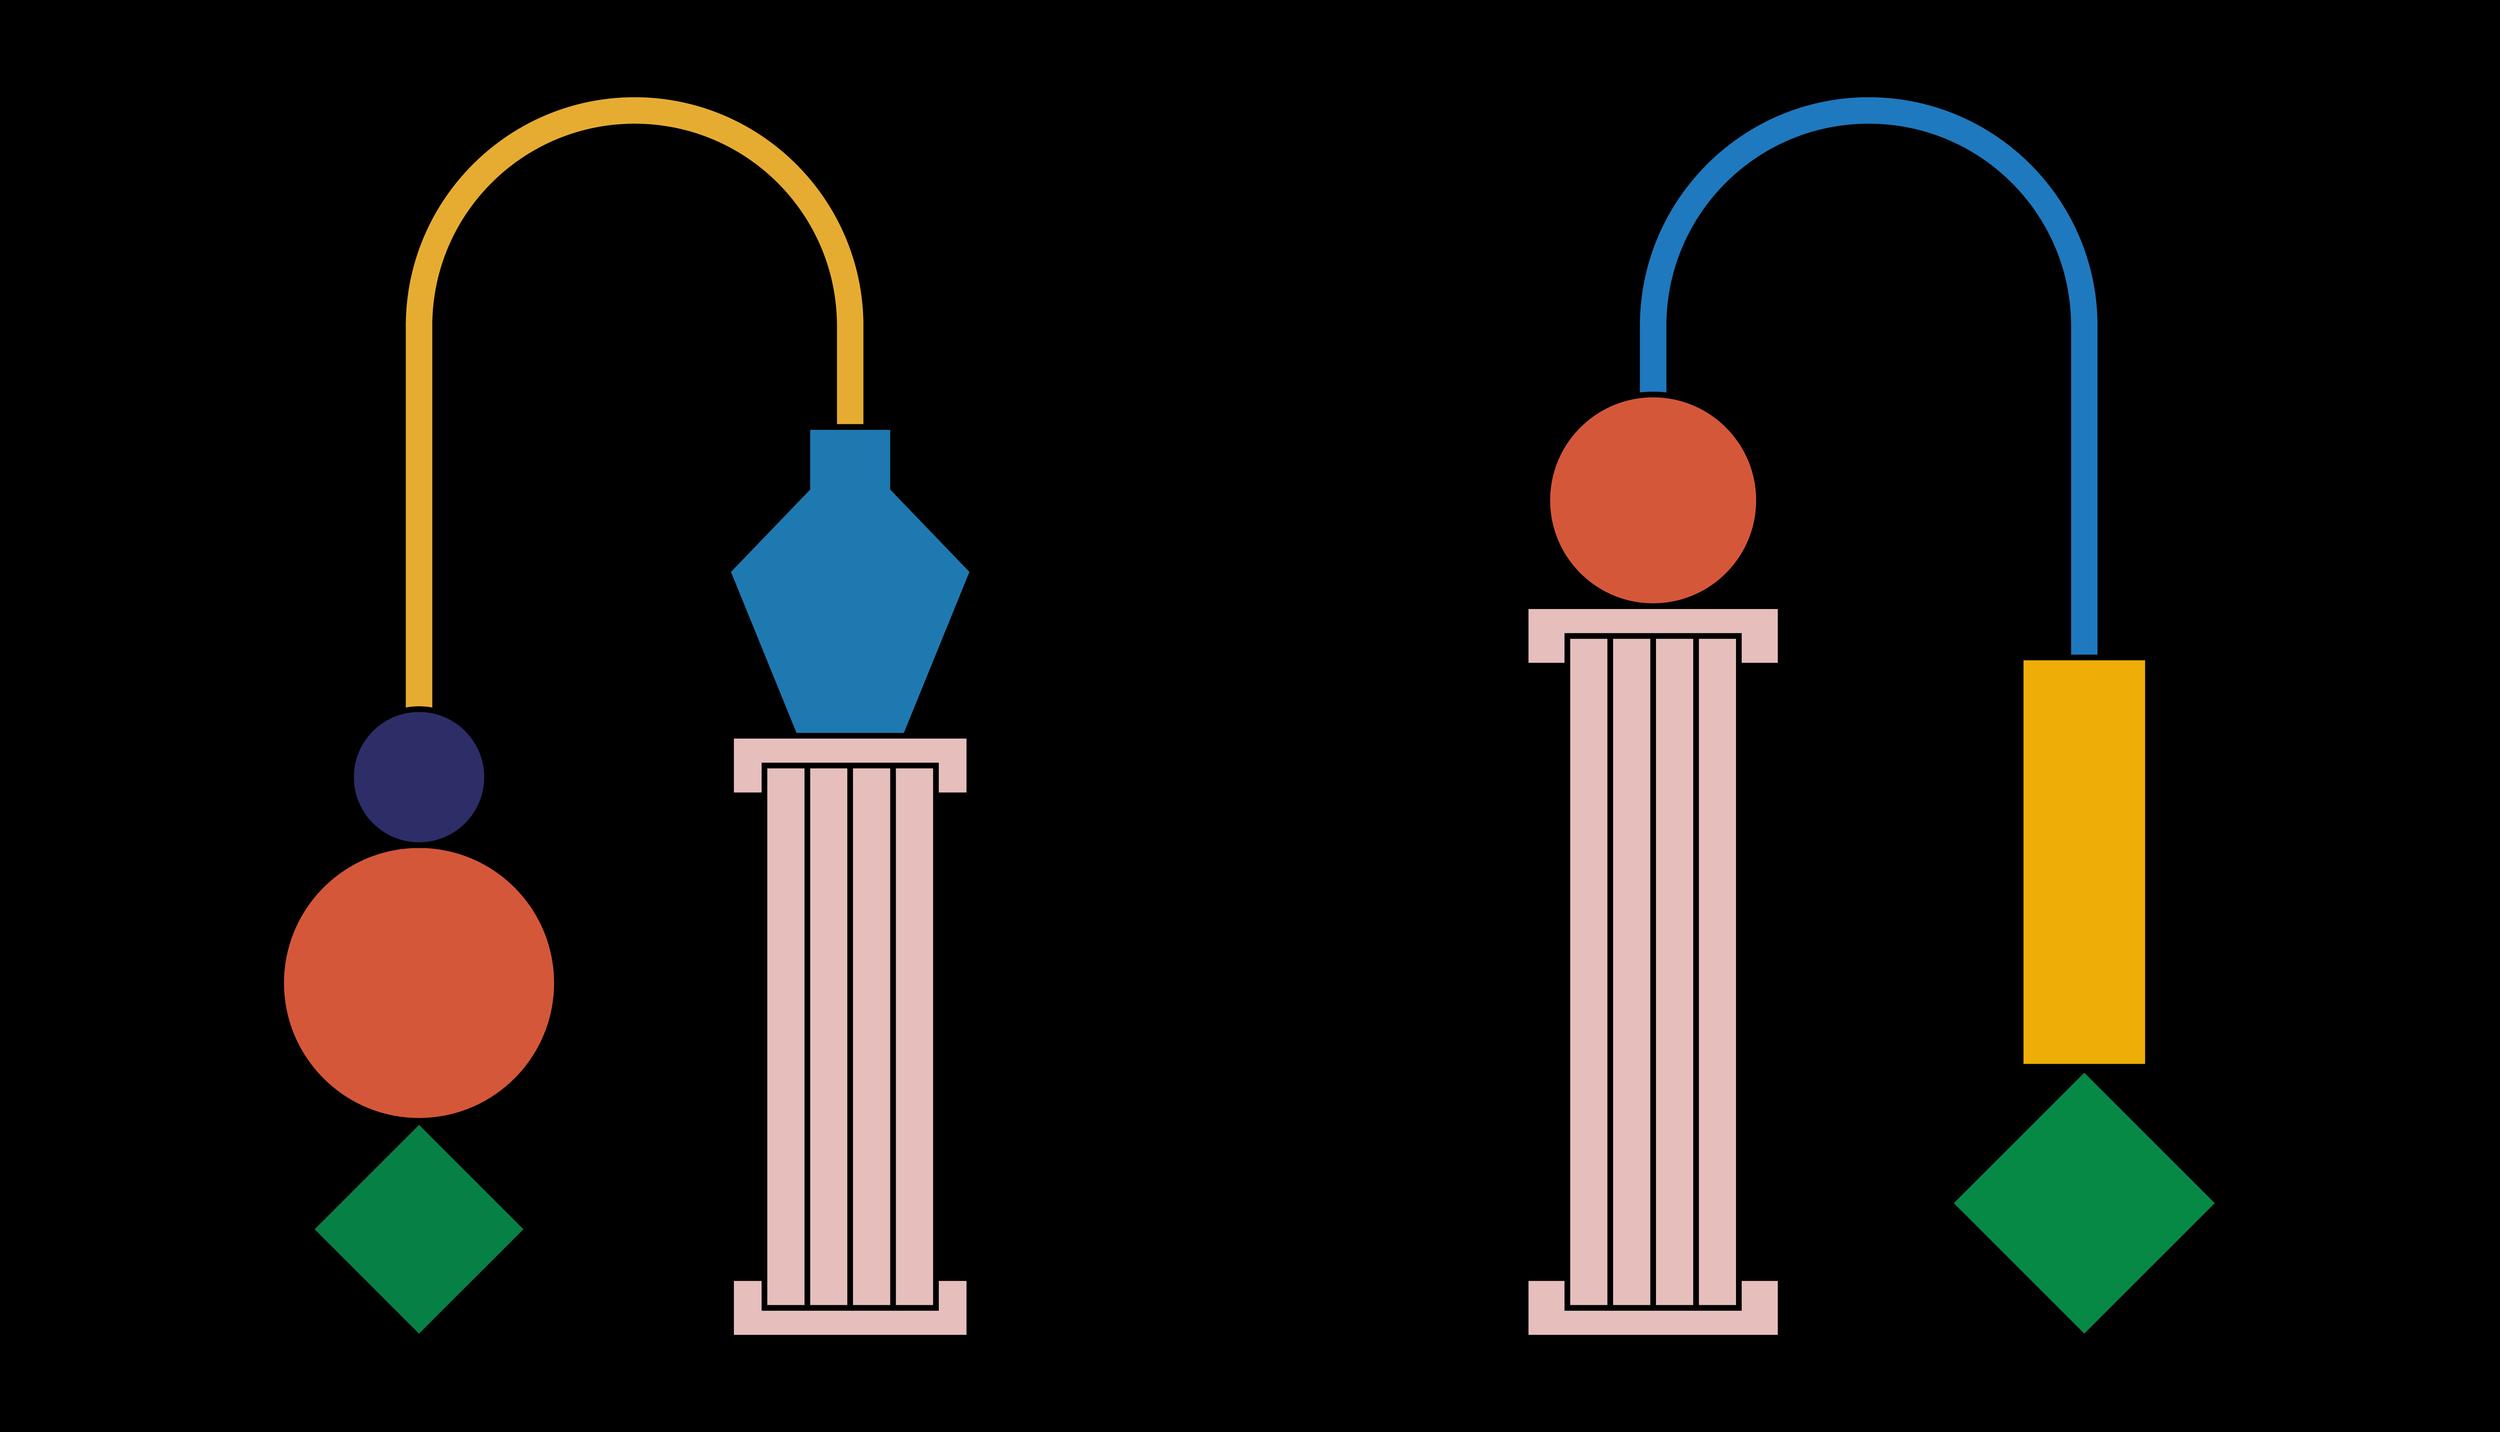 balance_illustration_03.png